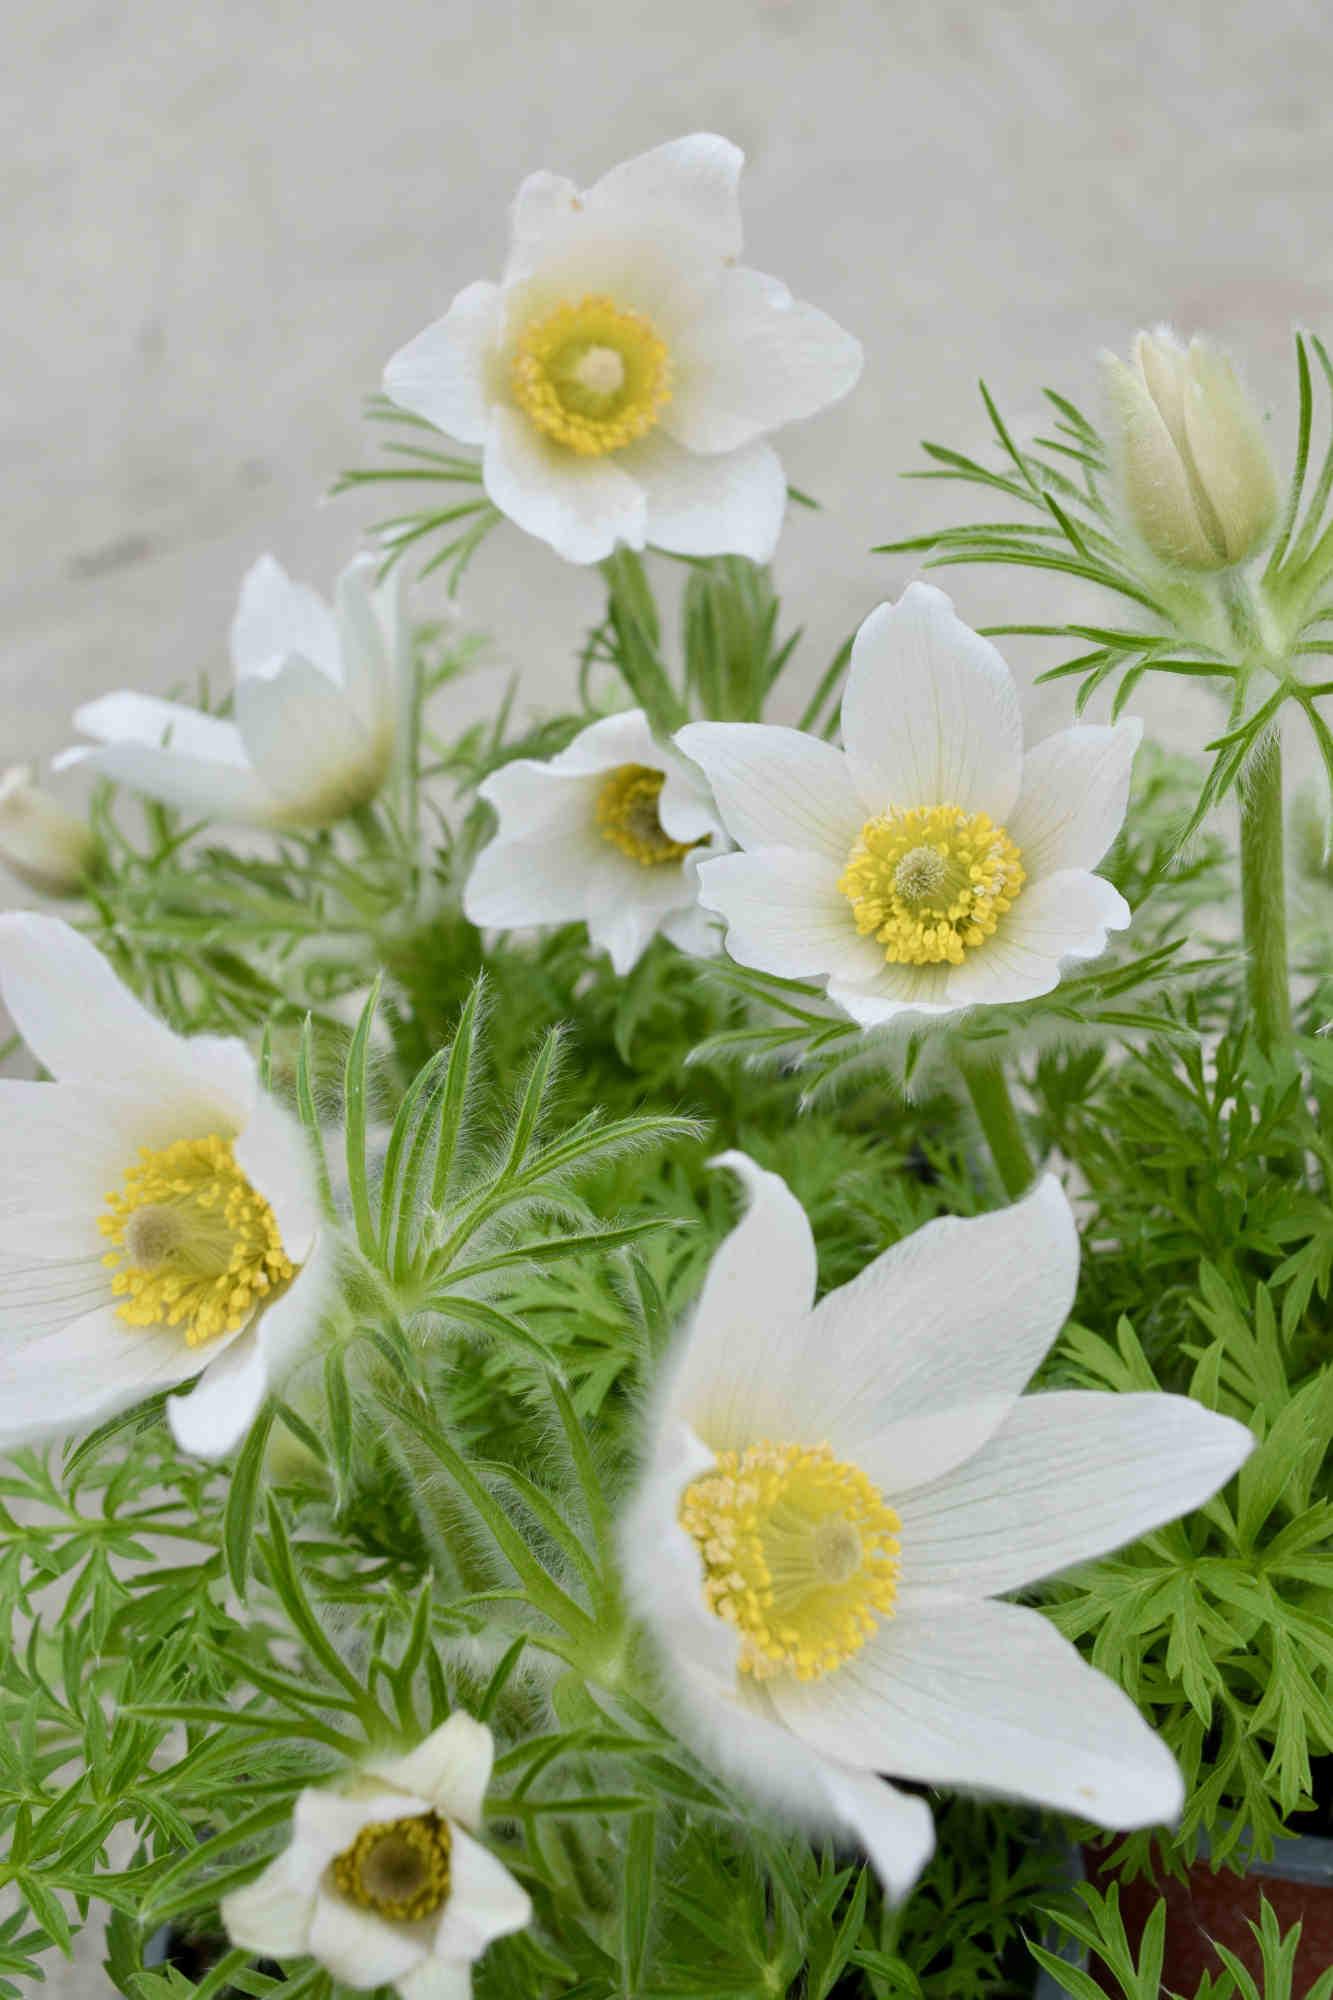 Küchenschelle 'Pinwheel White' - Pulsatilla vulgaris 'Pinwheel White'